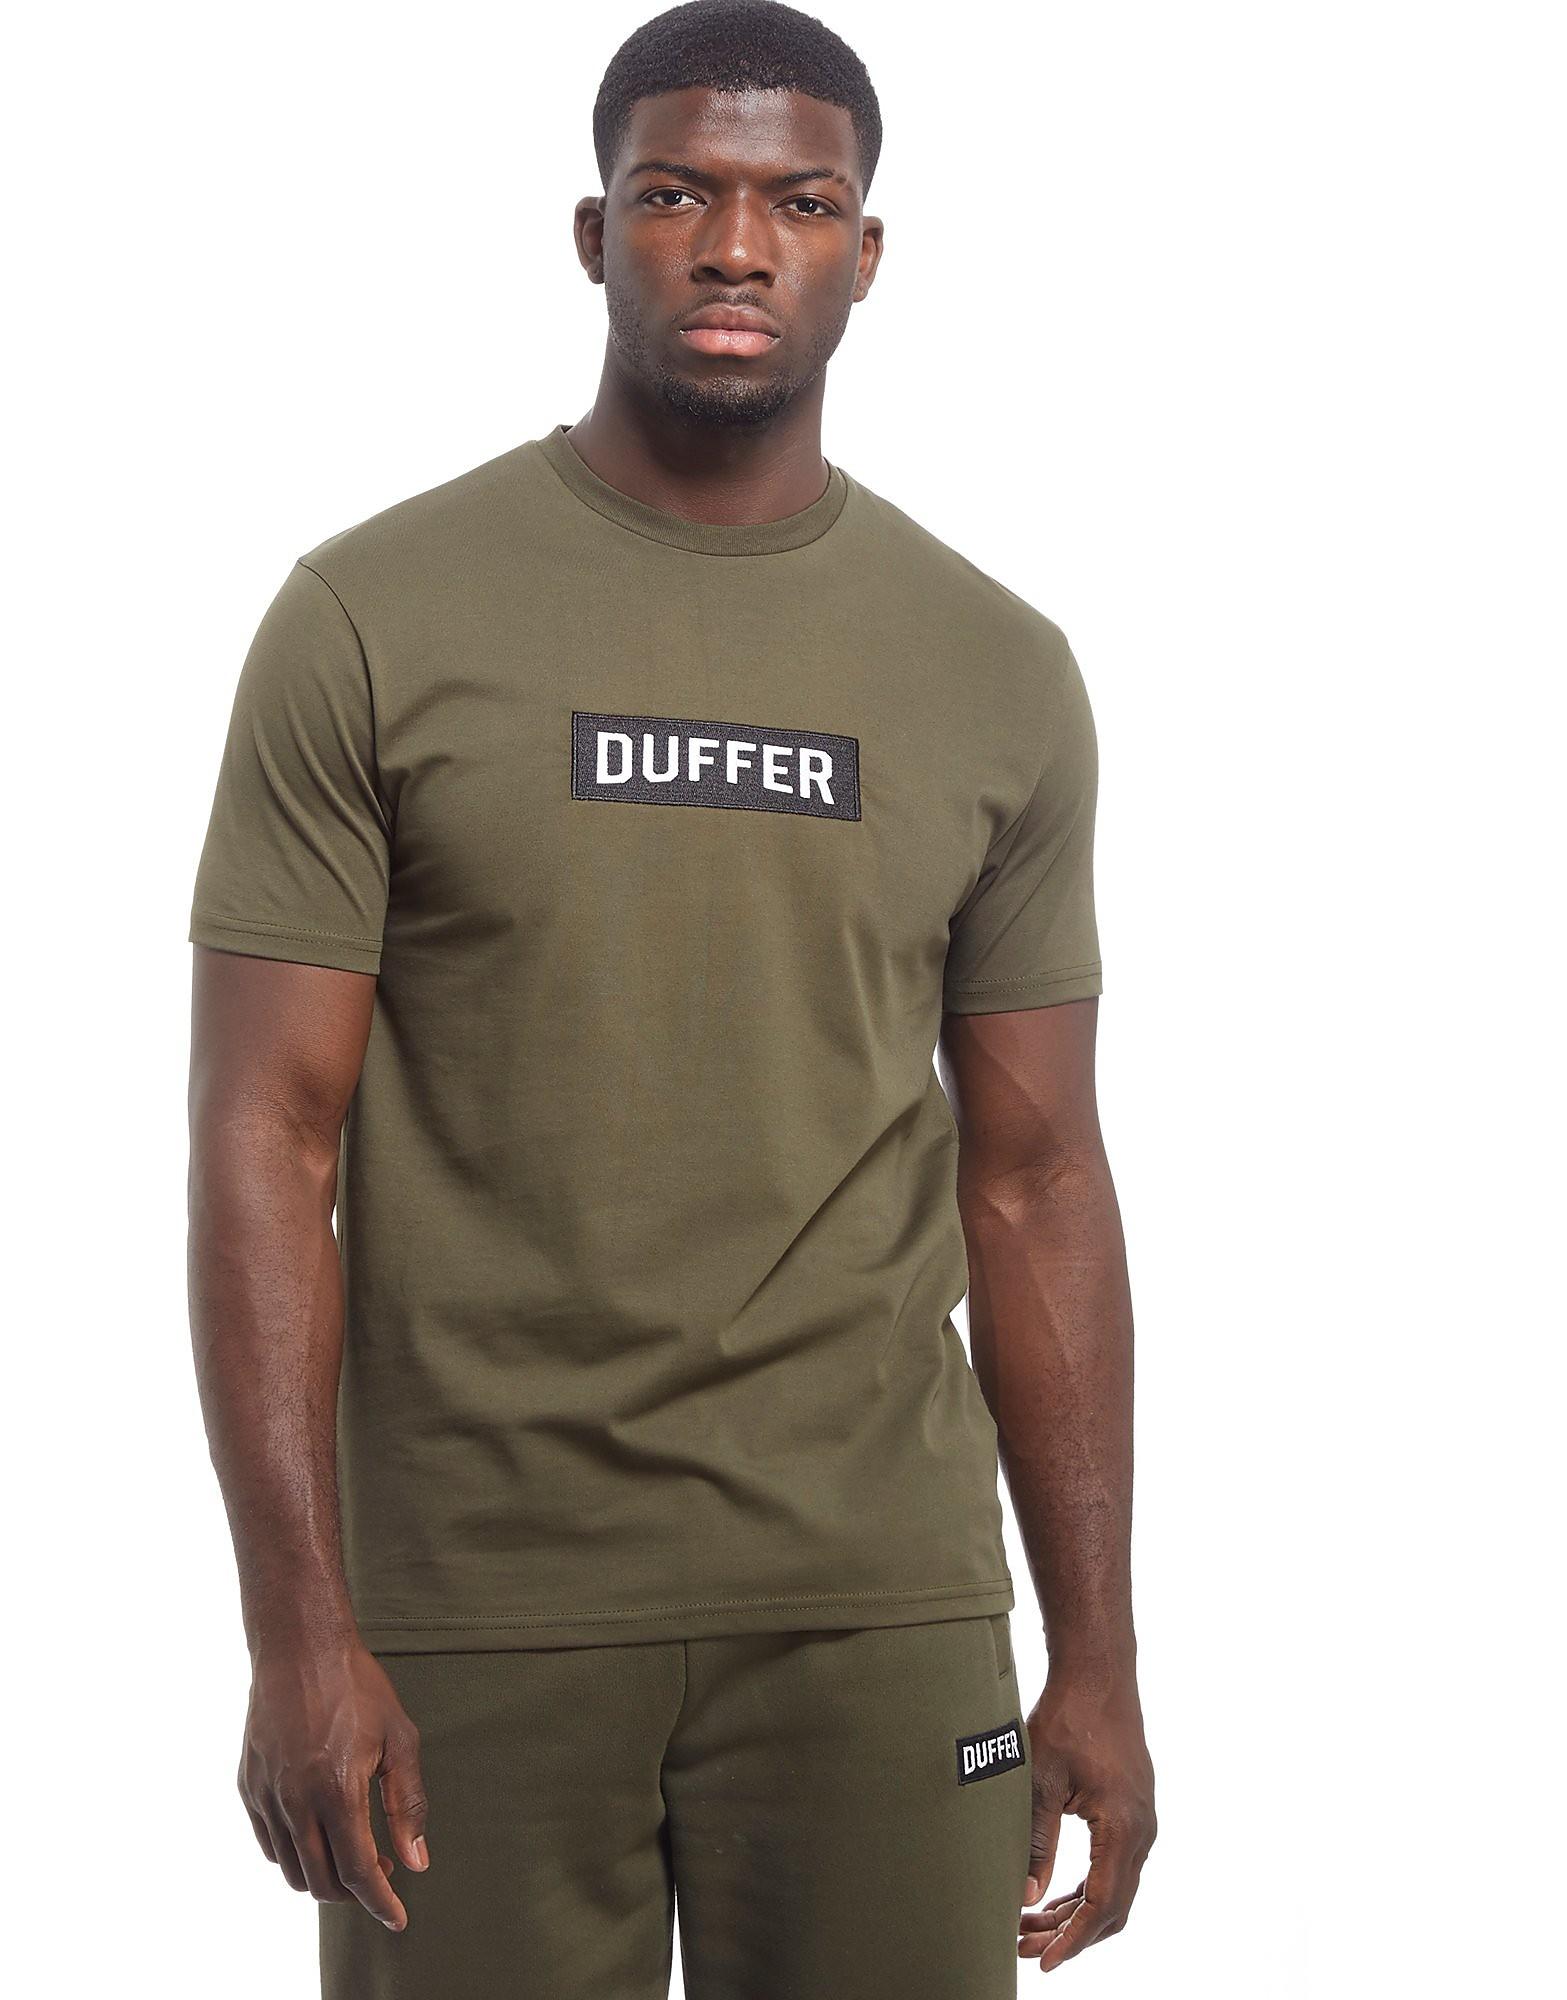 Duffer of St George Logo T-Shirt